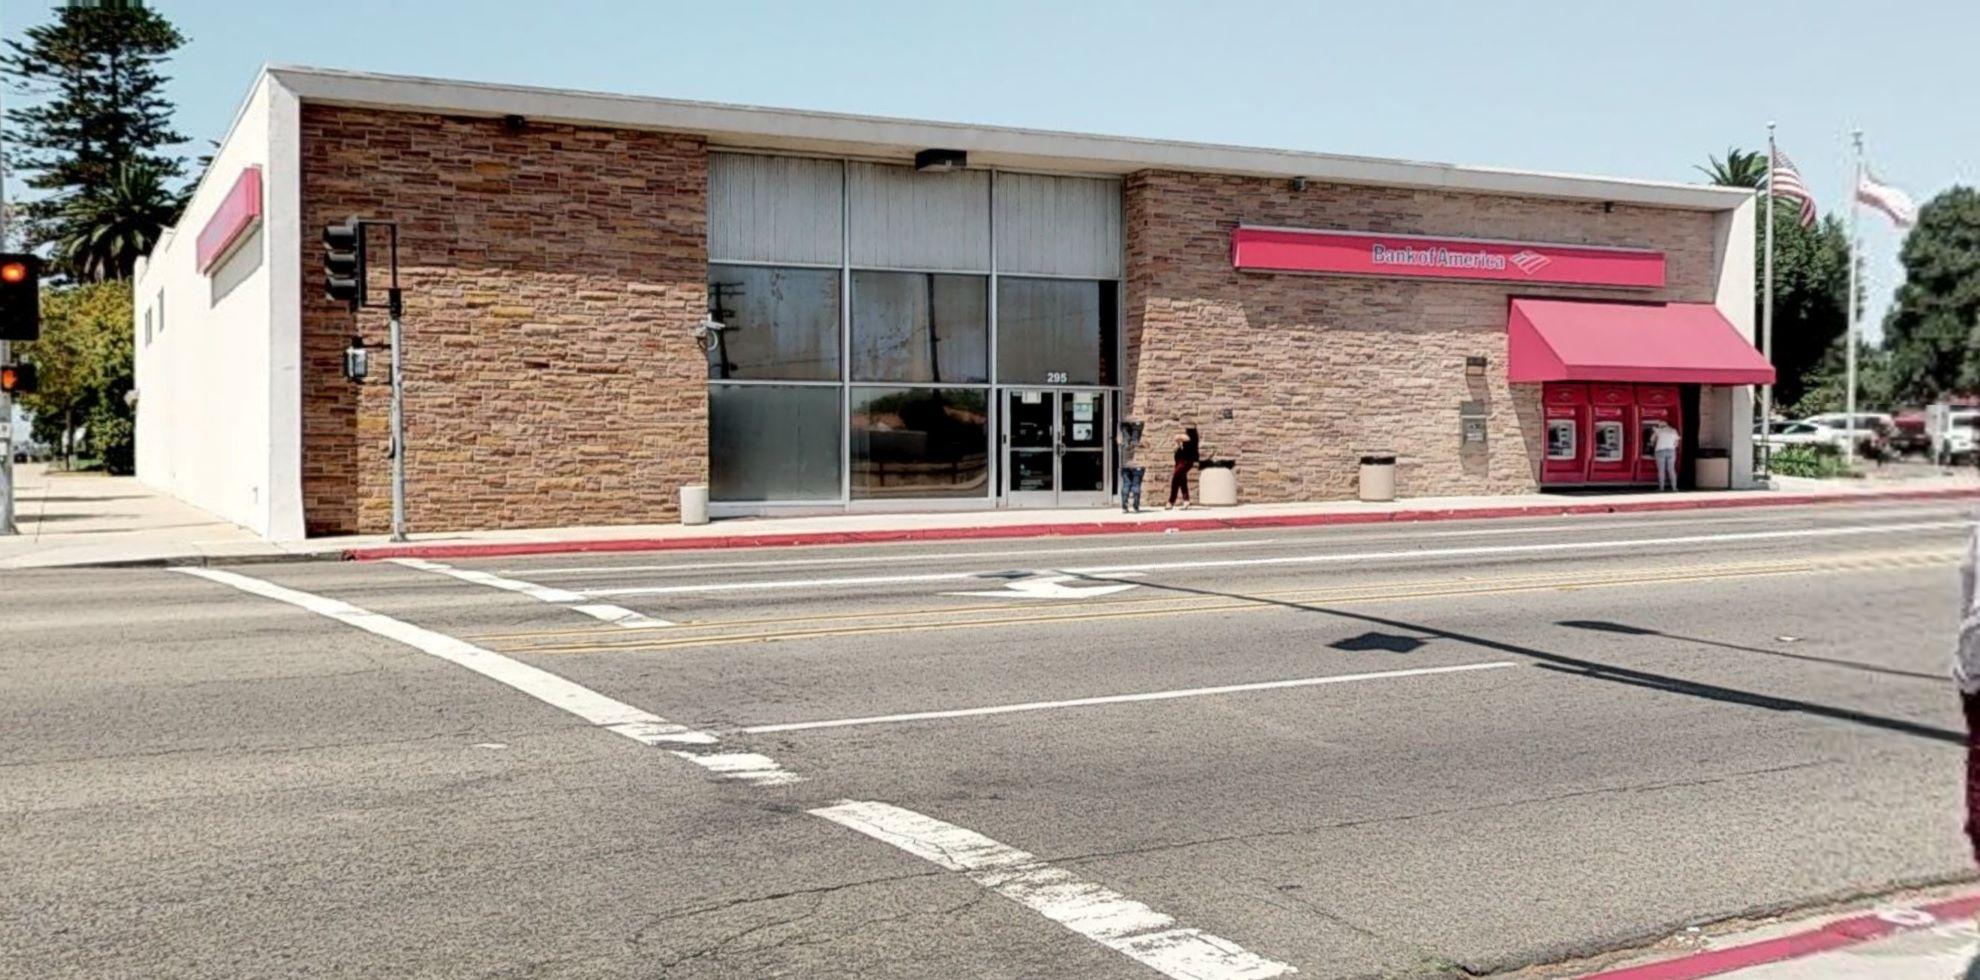 Bank of America financial center with walk-up ATM | 295 E St, Chula Vista, CA 91910